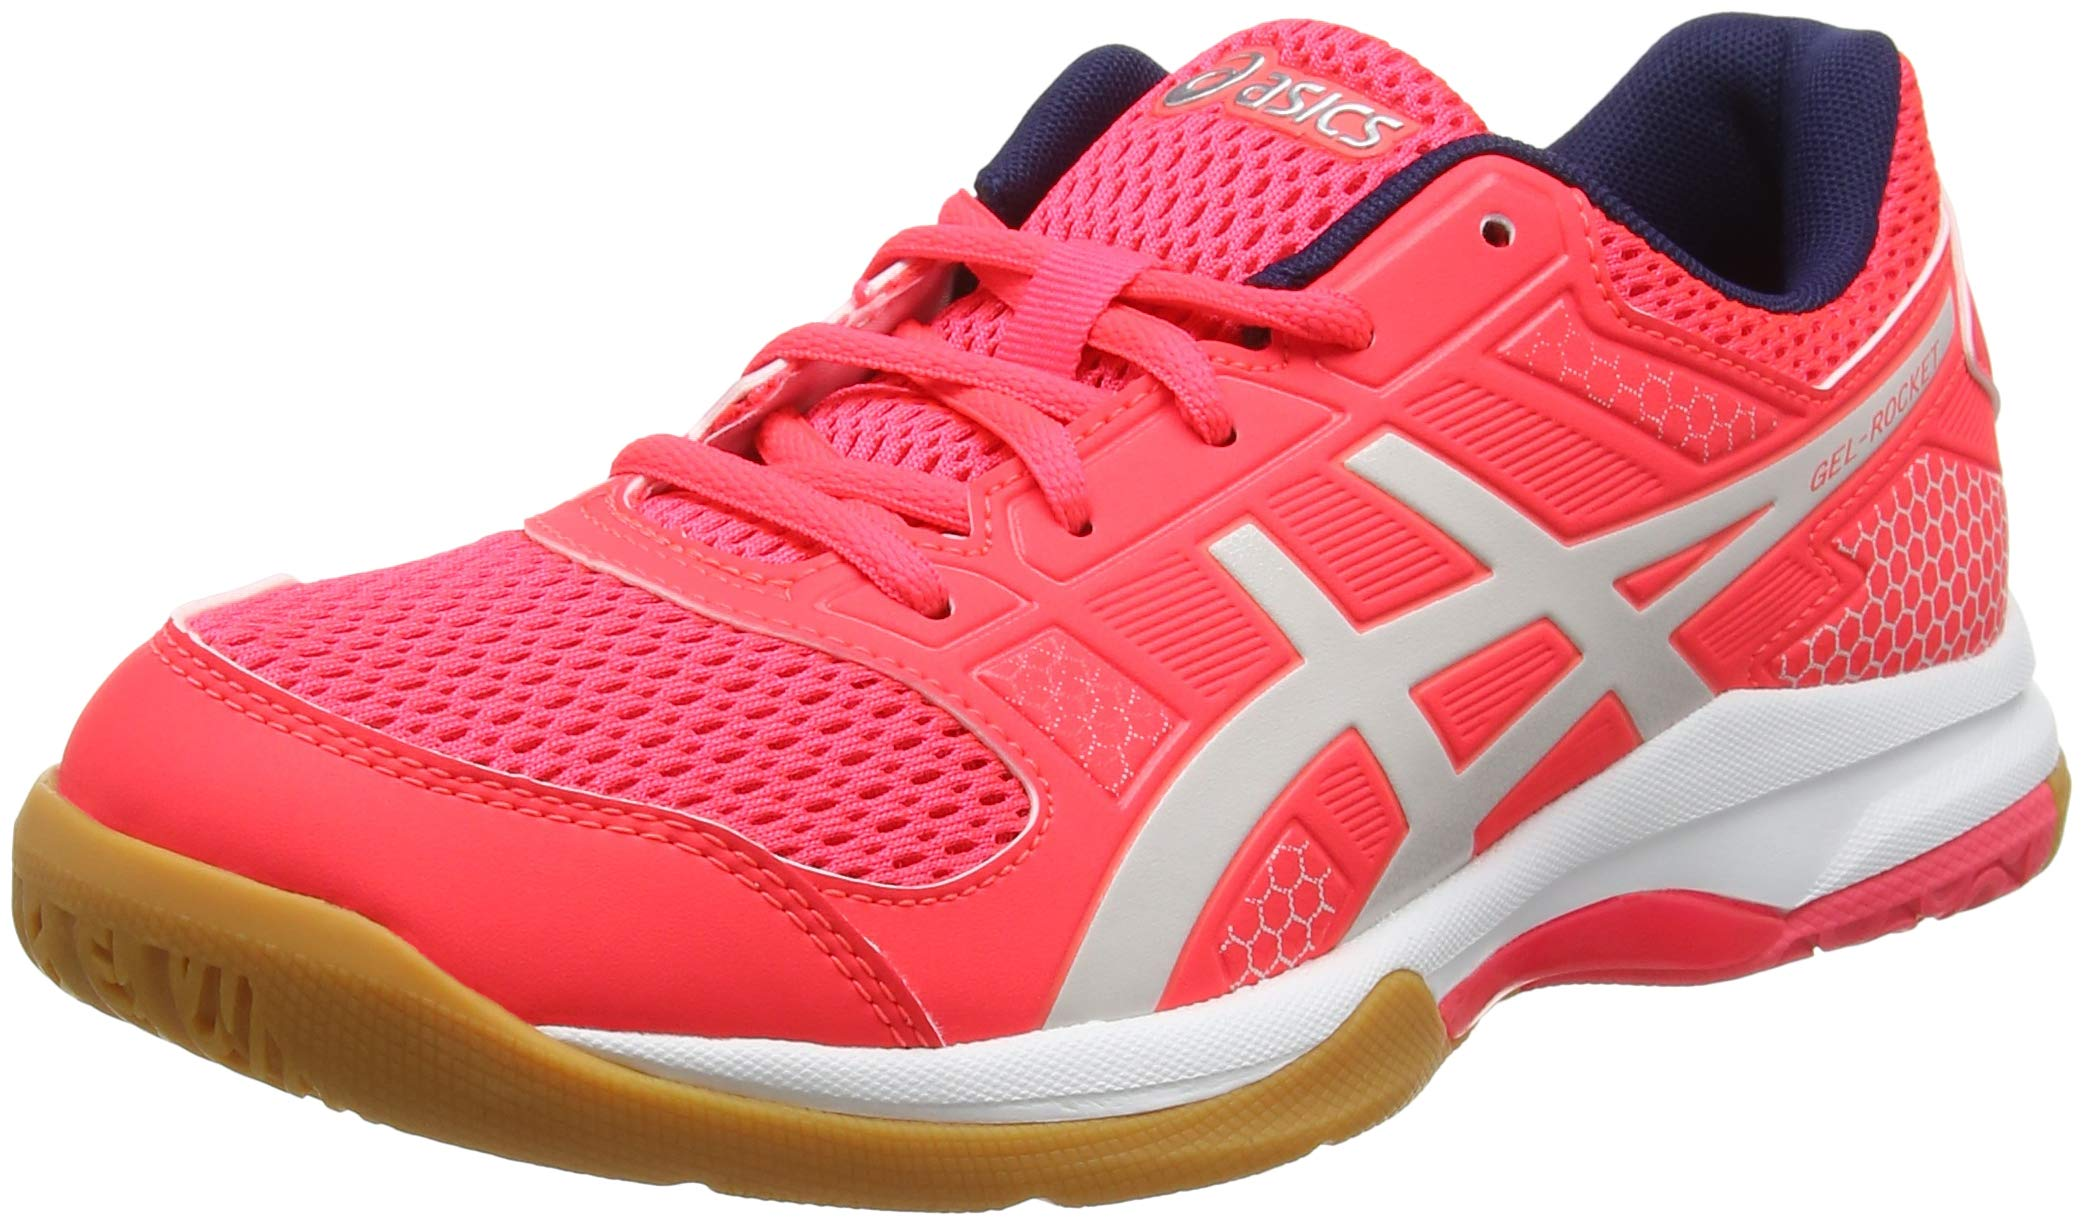 Asics Gel-Rocket 8, Zapatos de Voleibol para Mujer